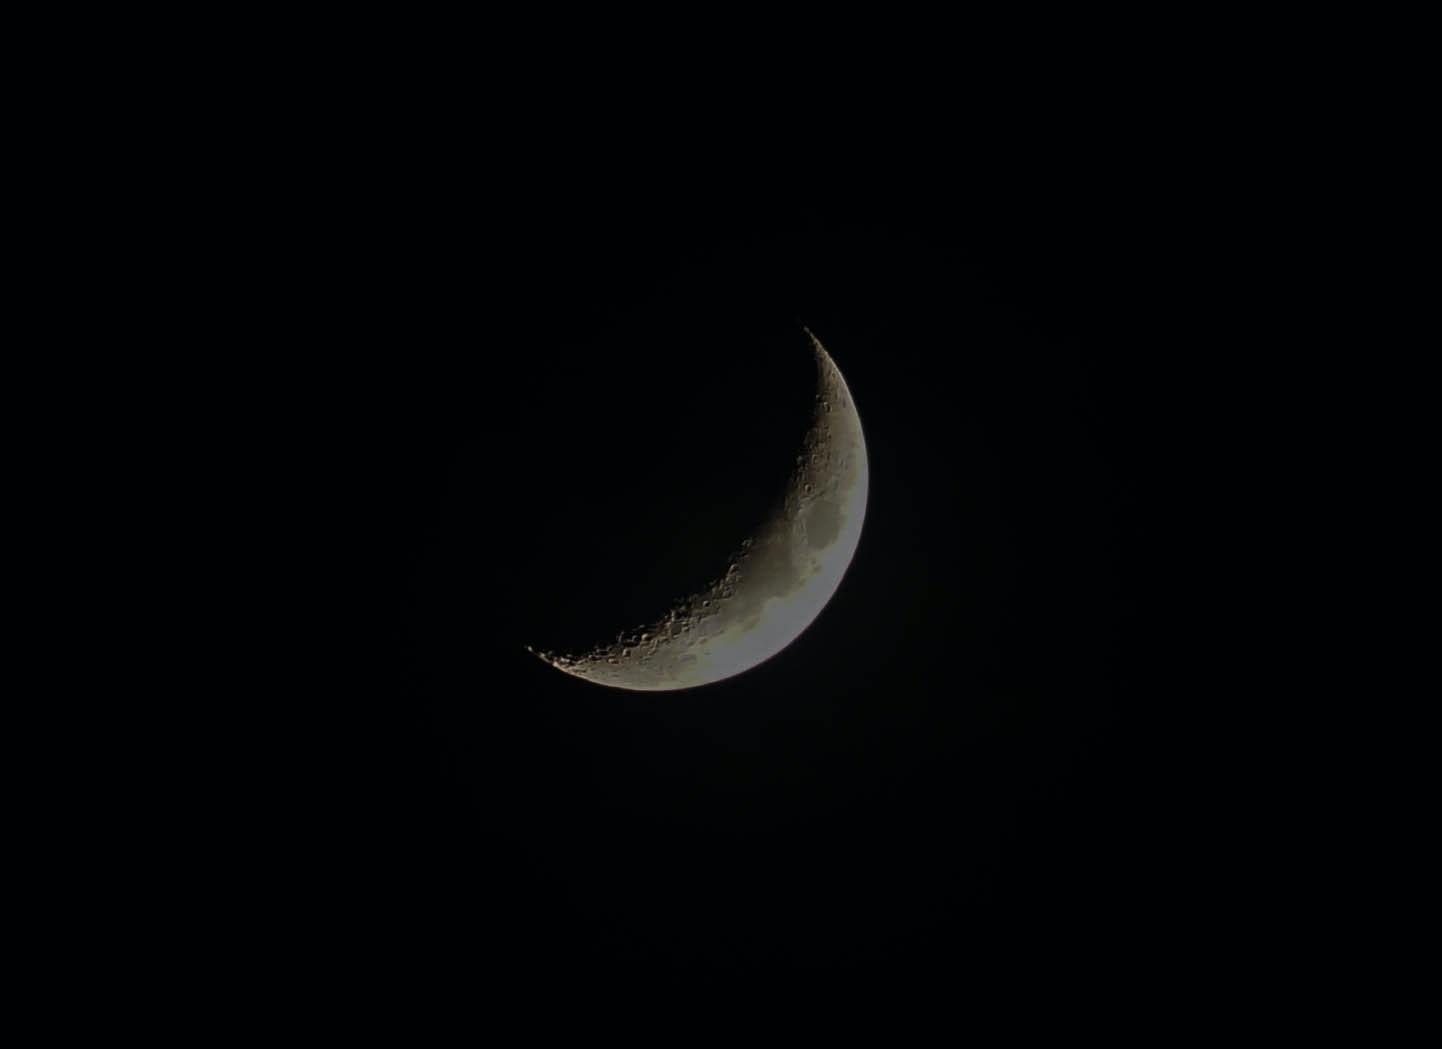 Cool Wallpaper Night Dark - night-dark-moon-slice  Image.jpg\u0026fm\u003djpg